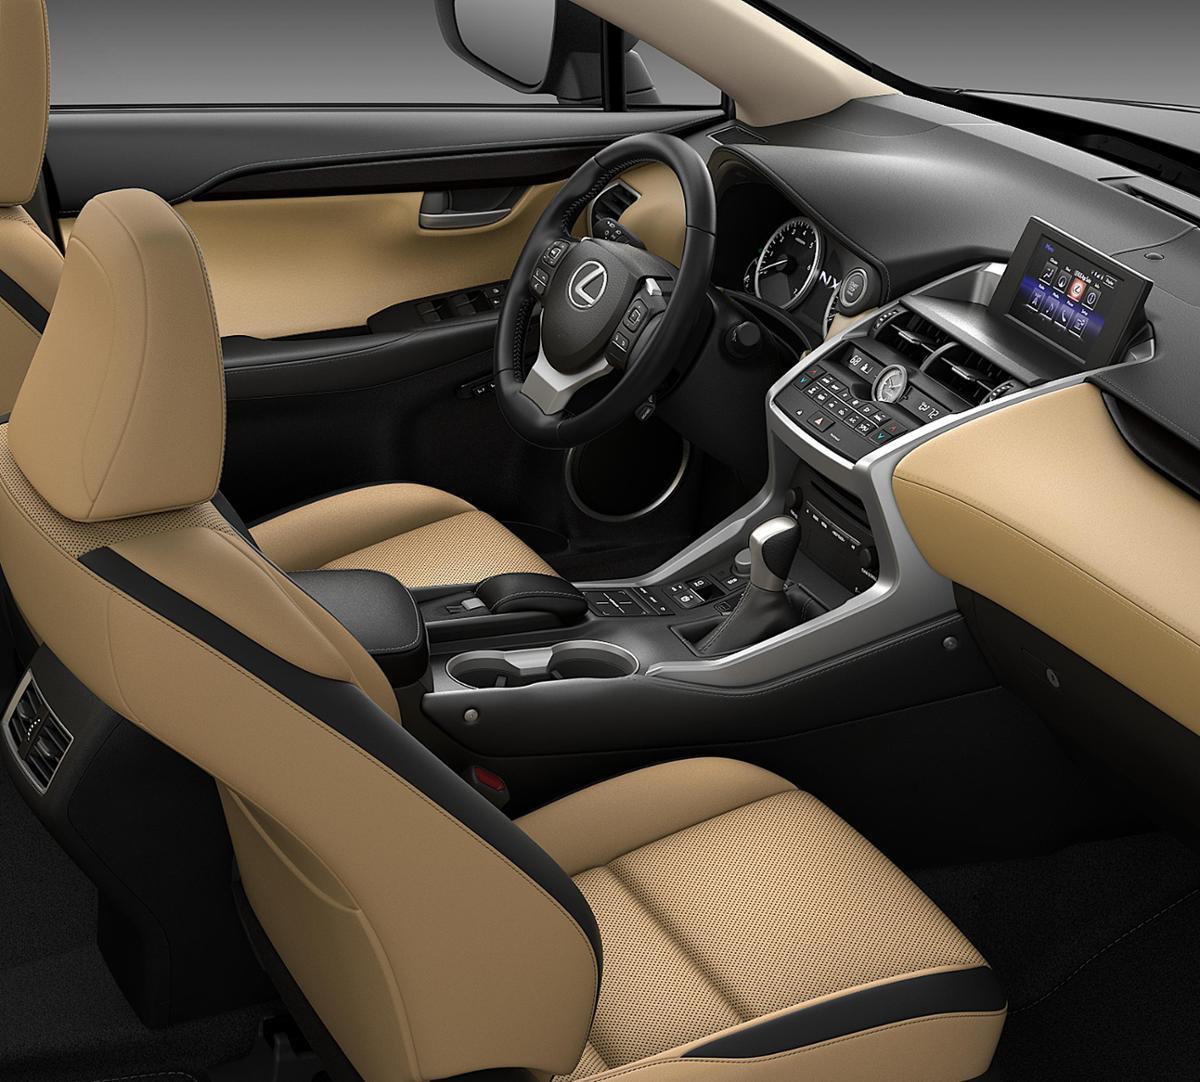 2016 Lexus Ct Interior: 2016 Lexus NX Turbo For Sale In Schaumburg